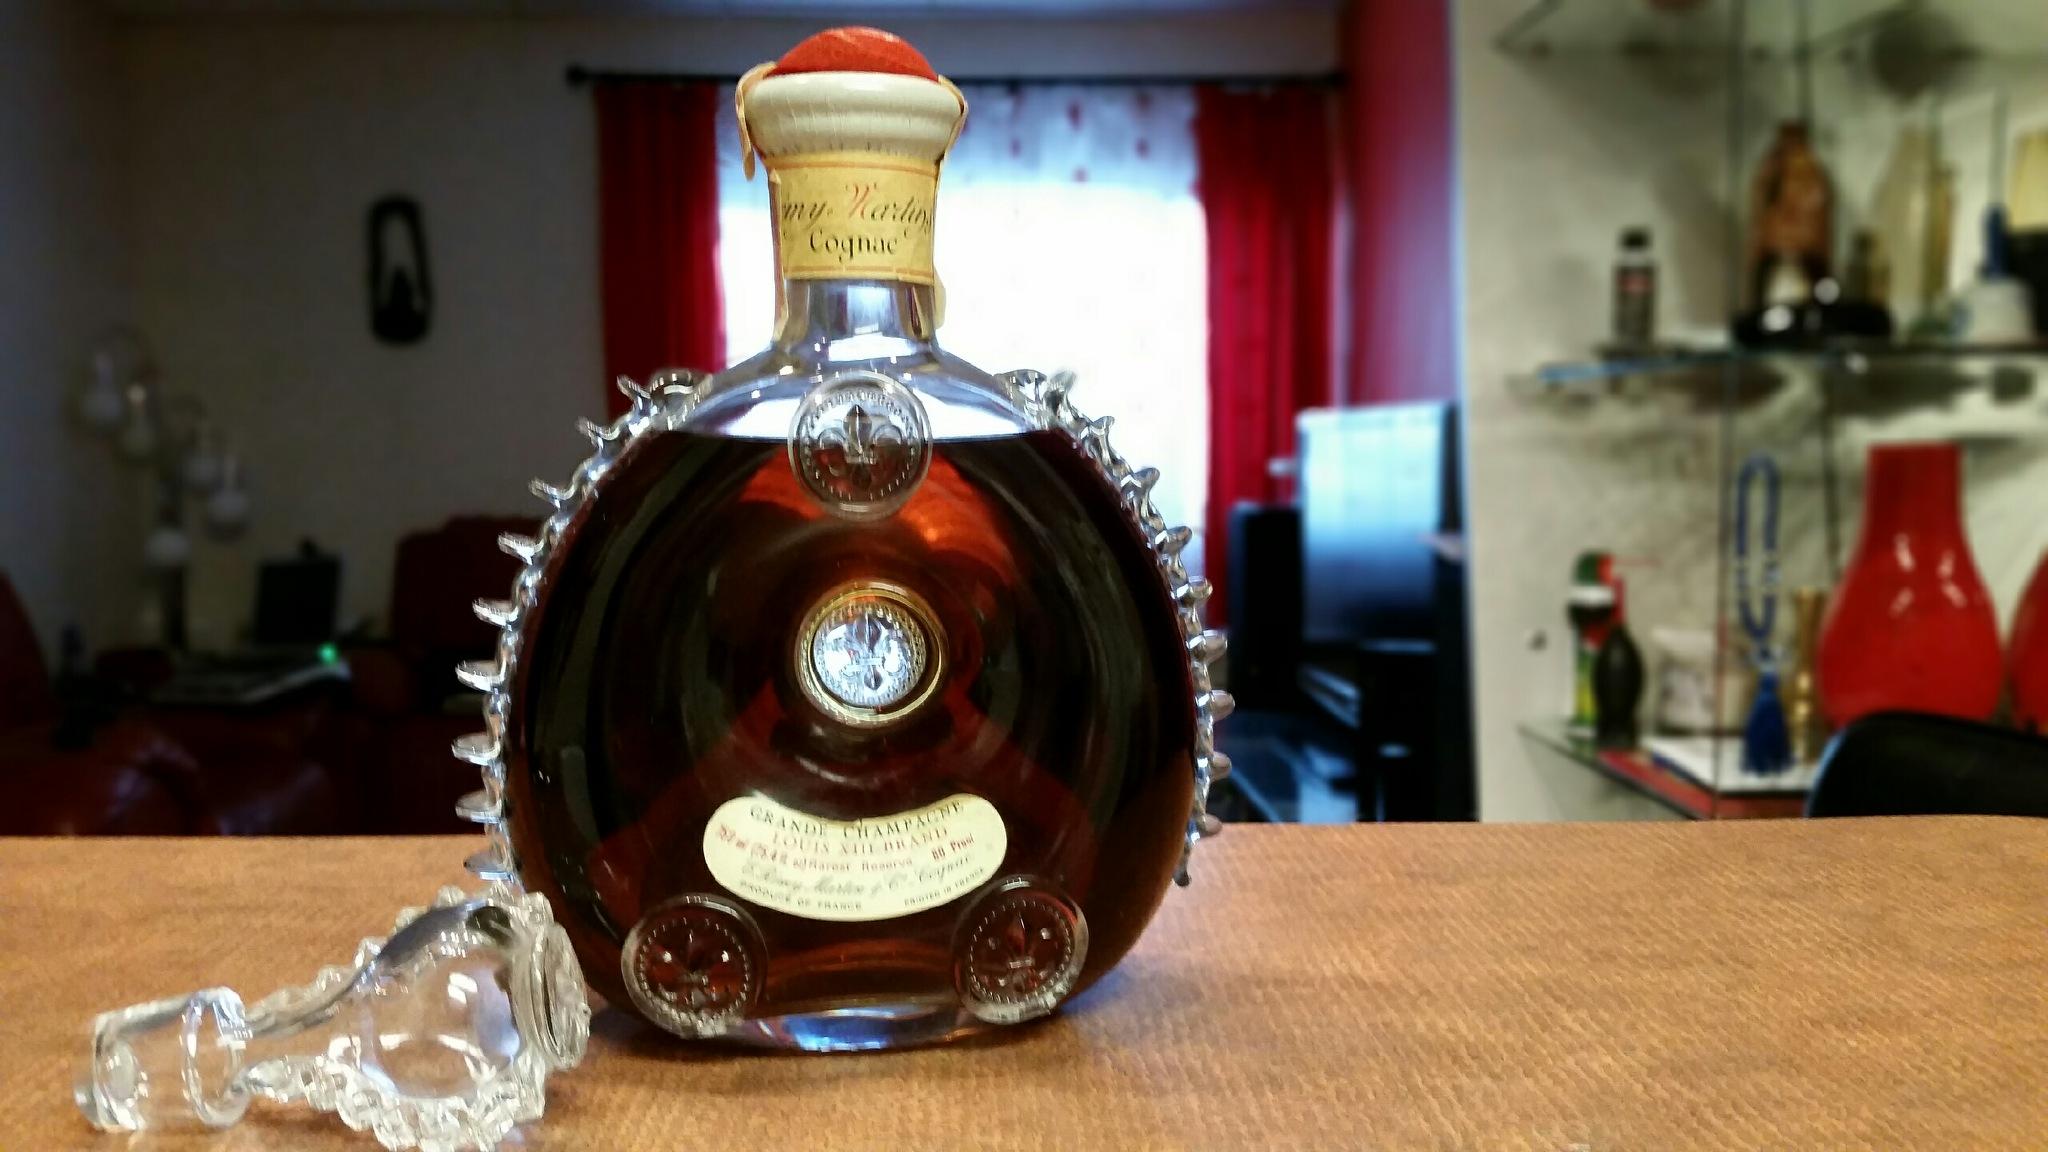 Remy Martin Cognac Grande Champagne Louis XIII Brand